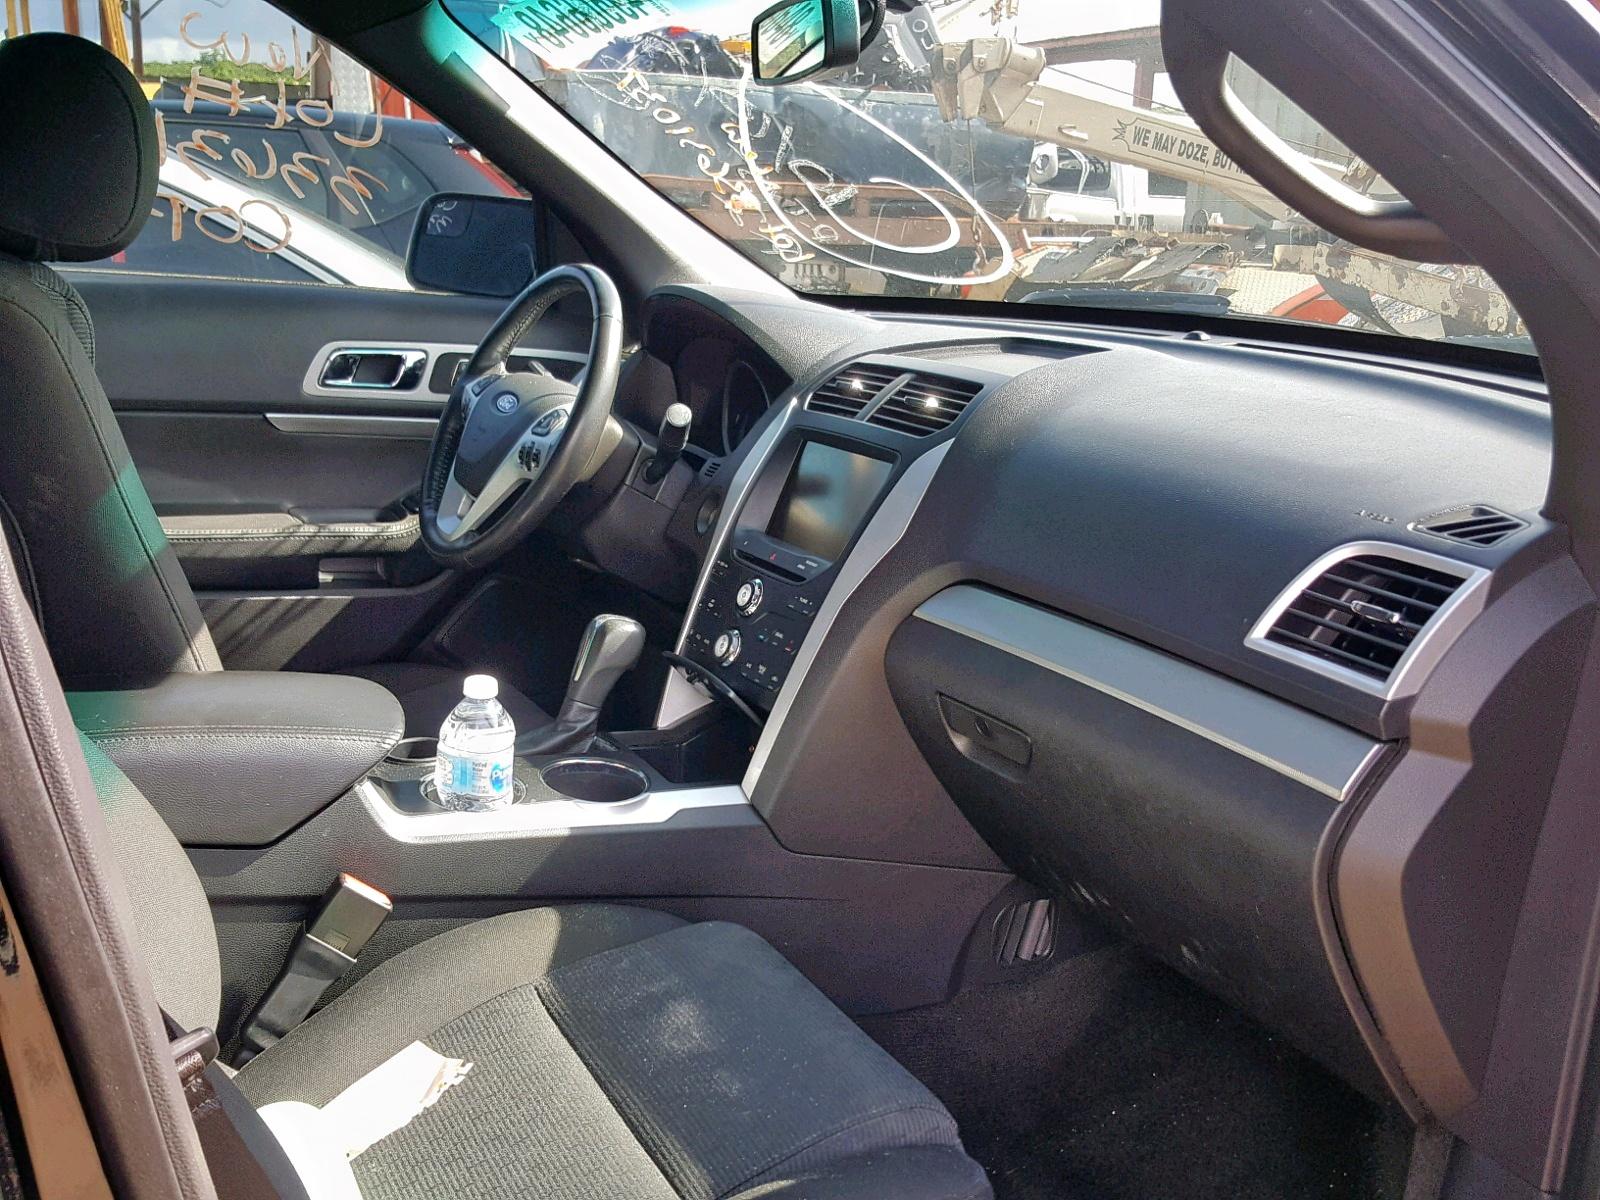 1FMHK7D85CGA54259 - 2012 Ford Explorer X 3.5L close up View